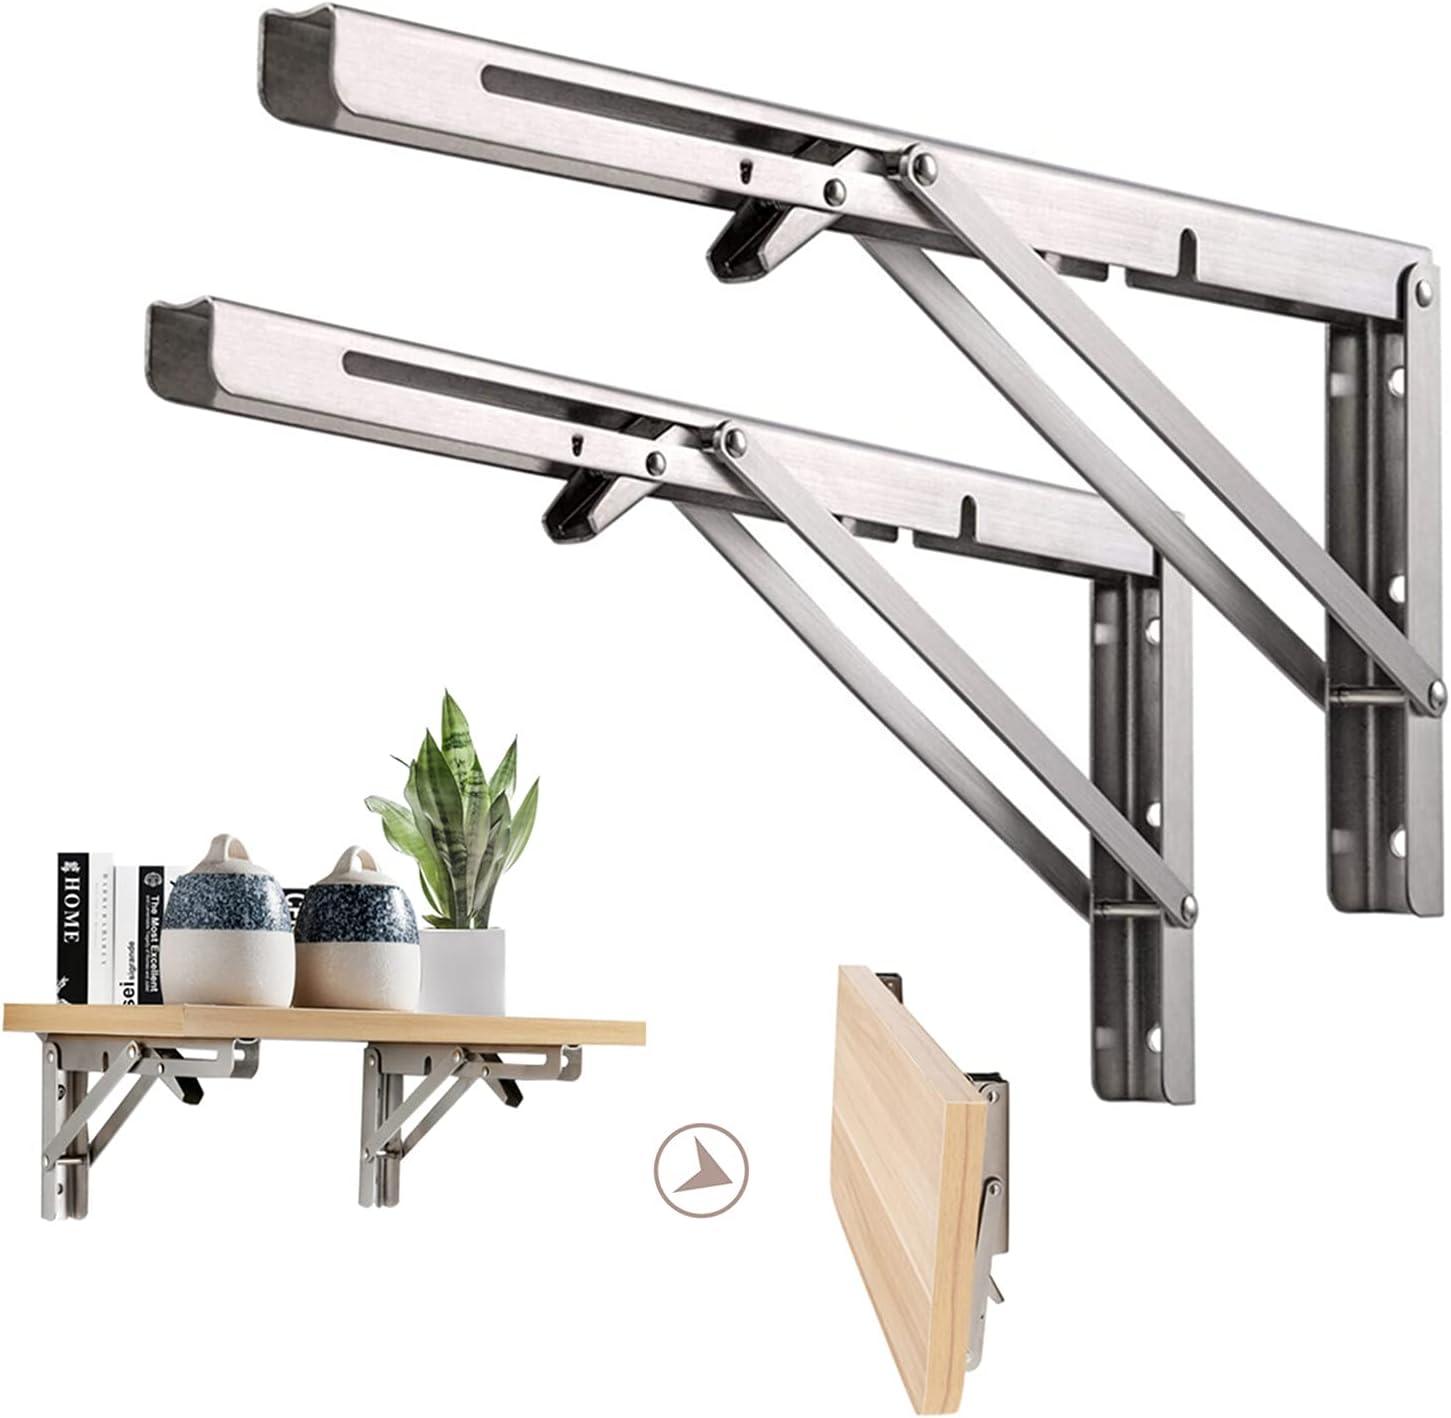 Folding Shelf Brackets 24inch Heavy Steel Stainless Duty Foldabl New Shipping Ranking TOP6 Free